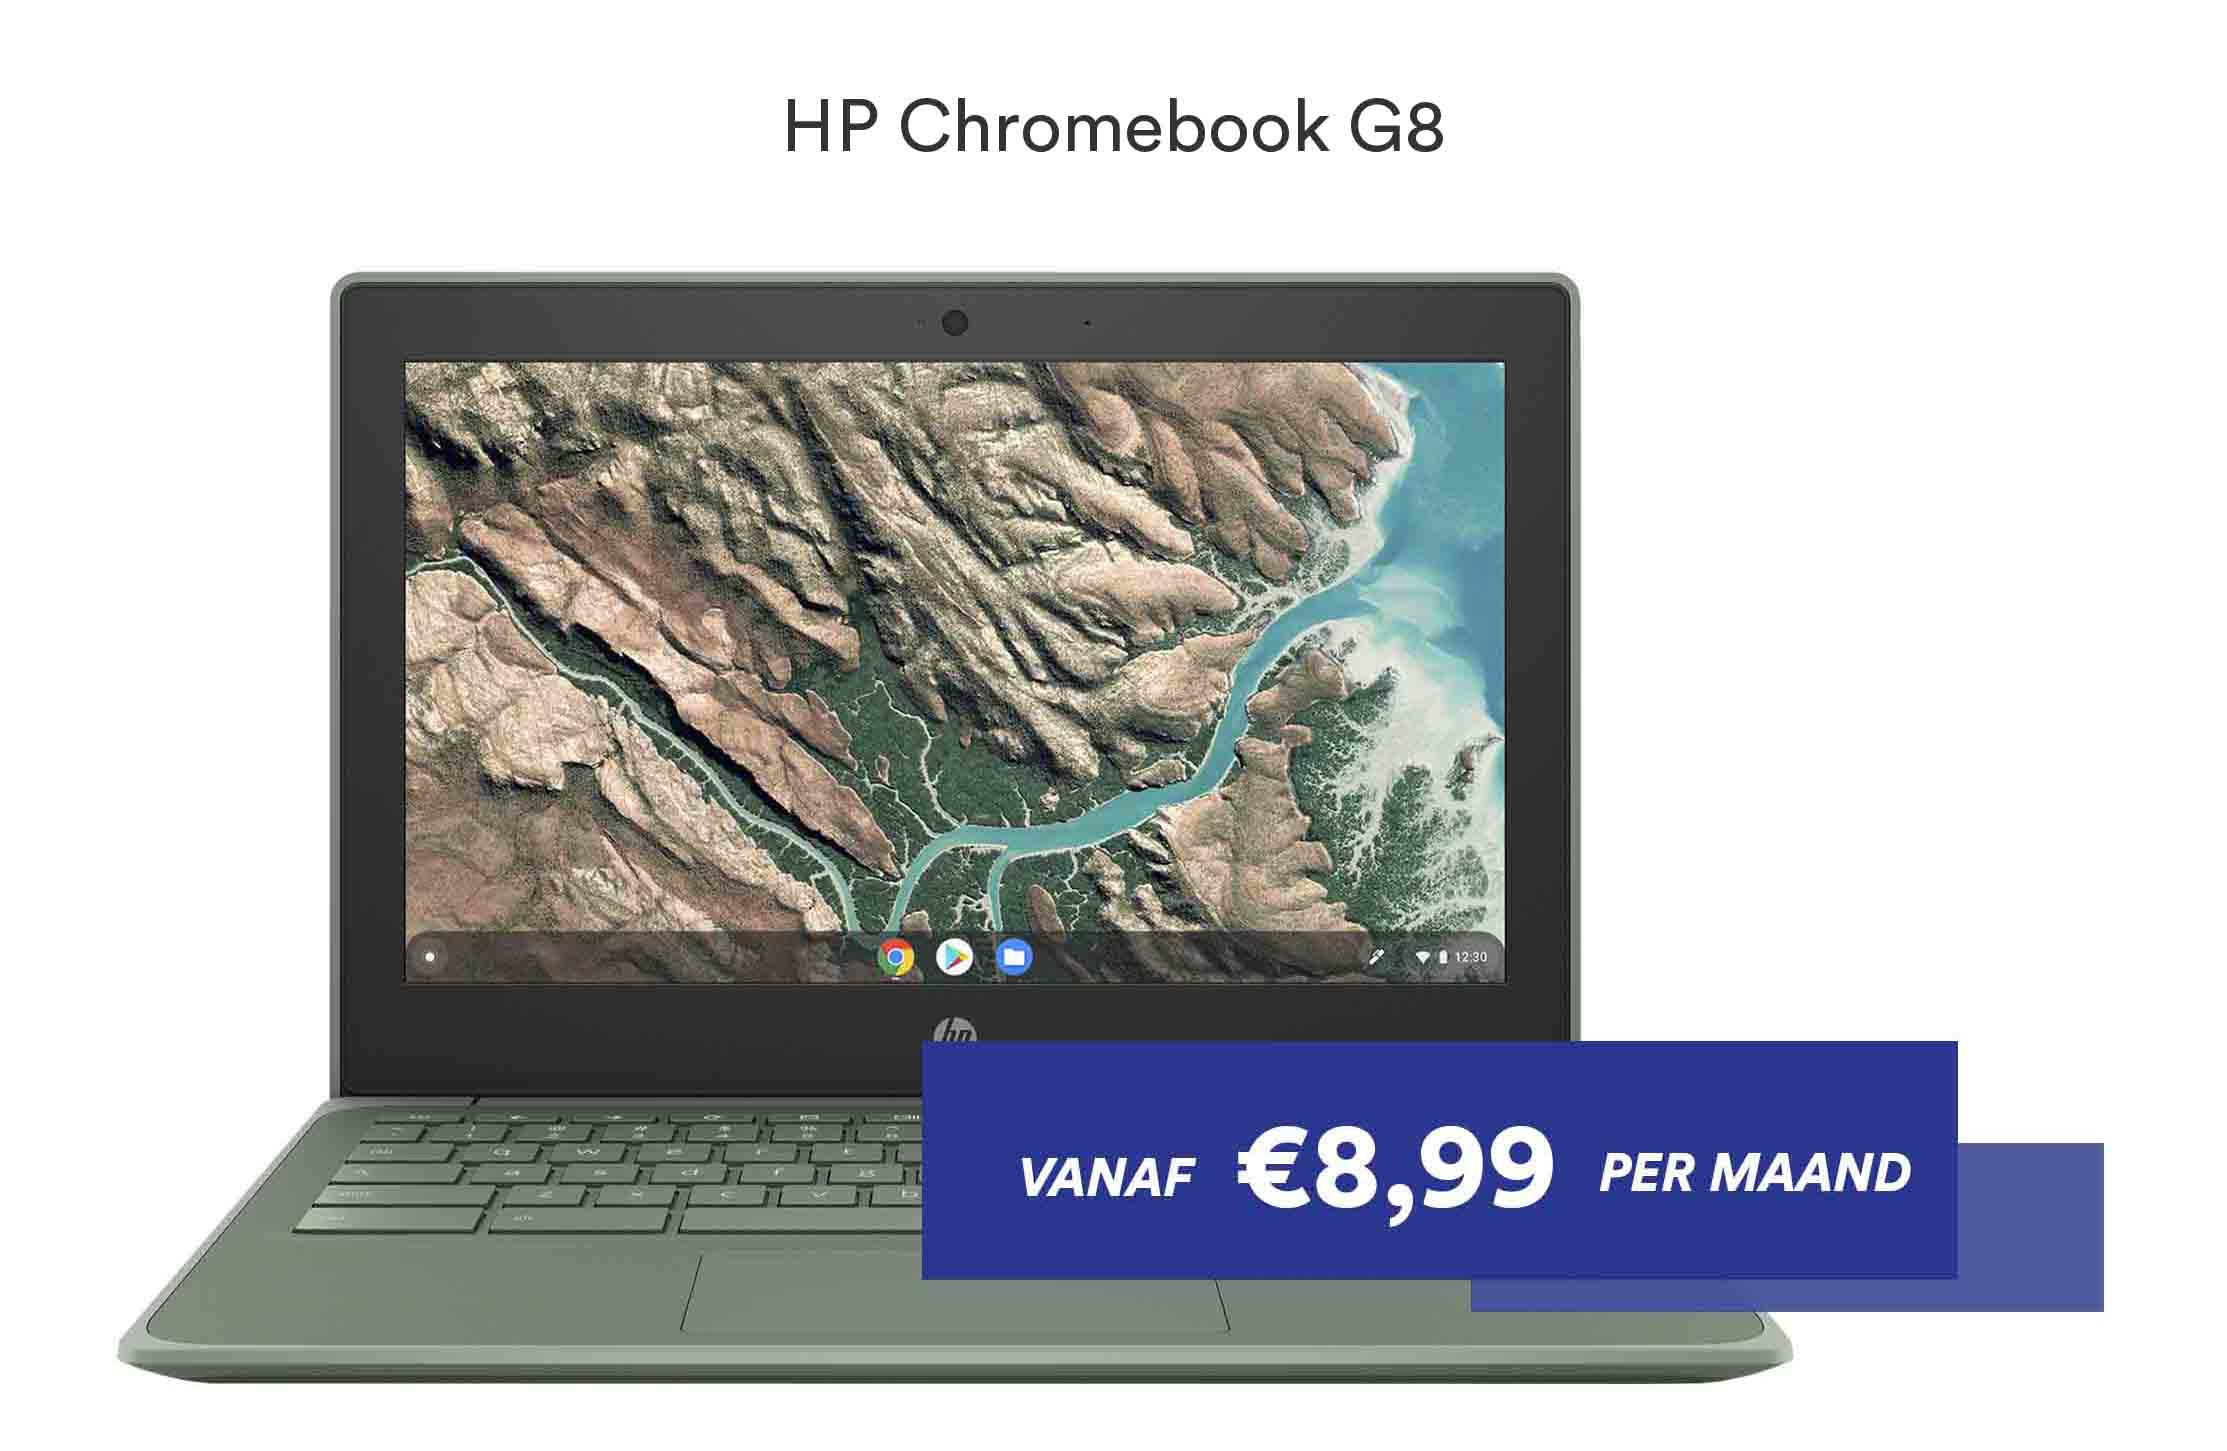 HP Chromebook G8